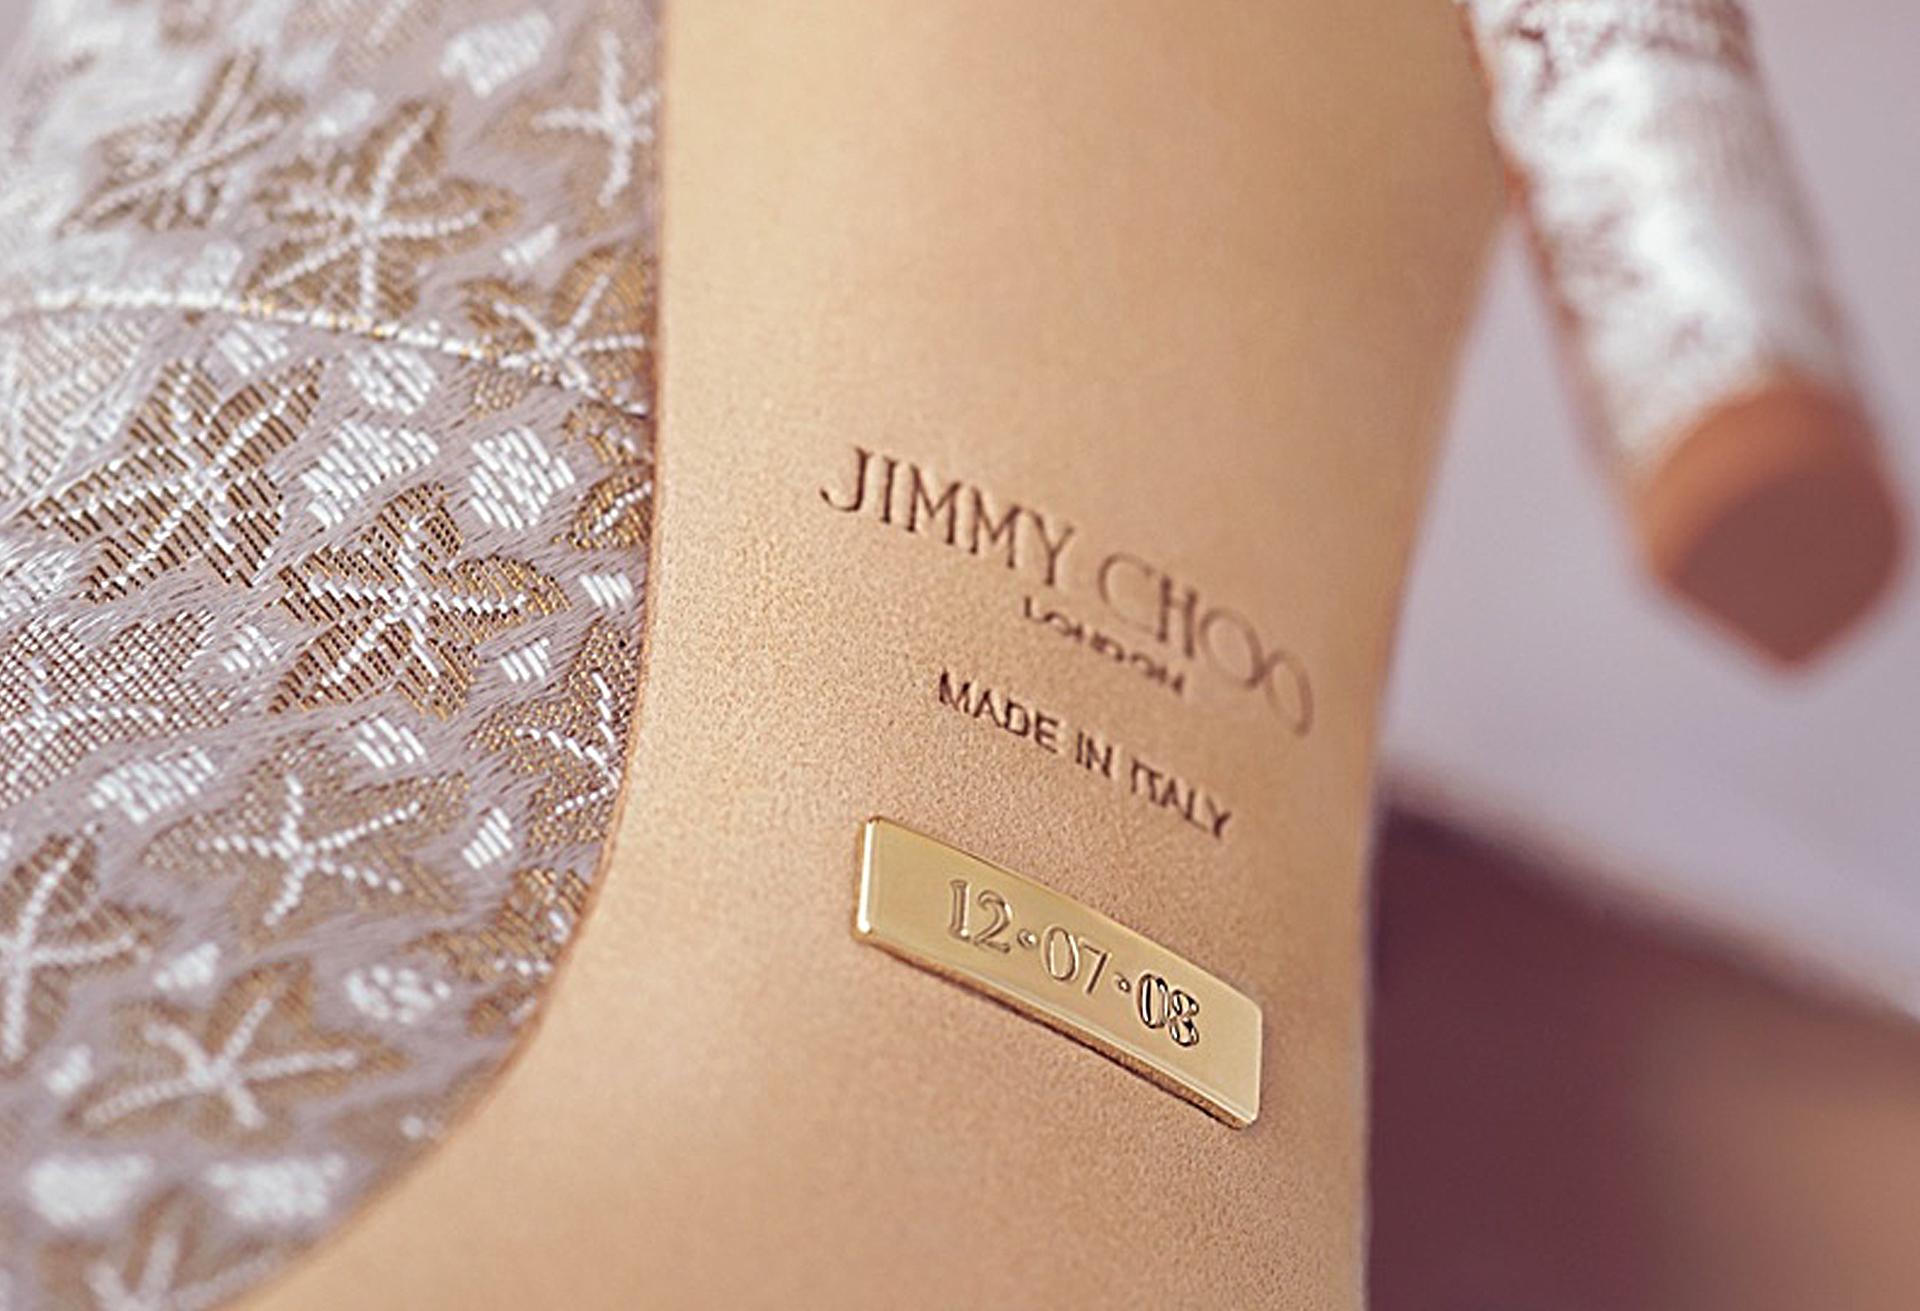 Jimmy Choo Brand Identity